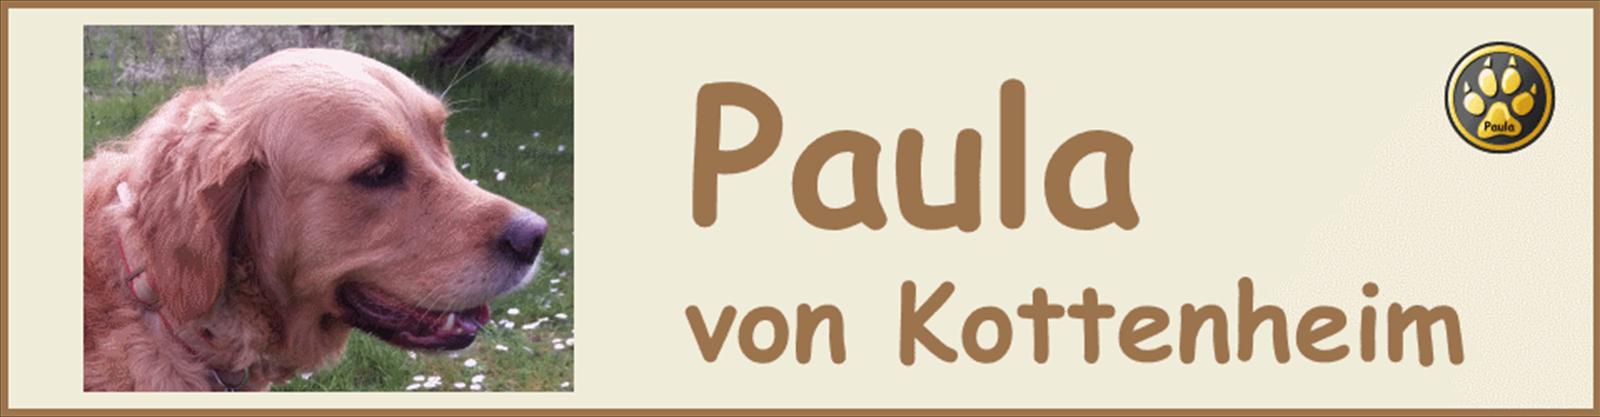 Paula-Banner-08